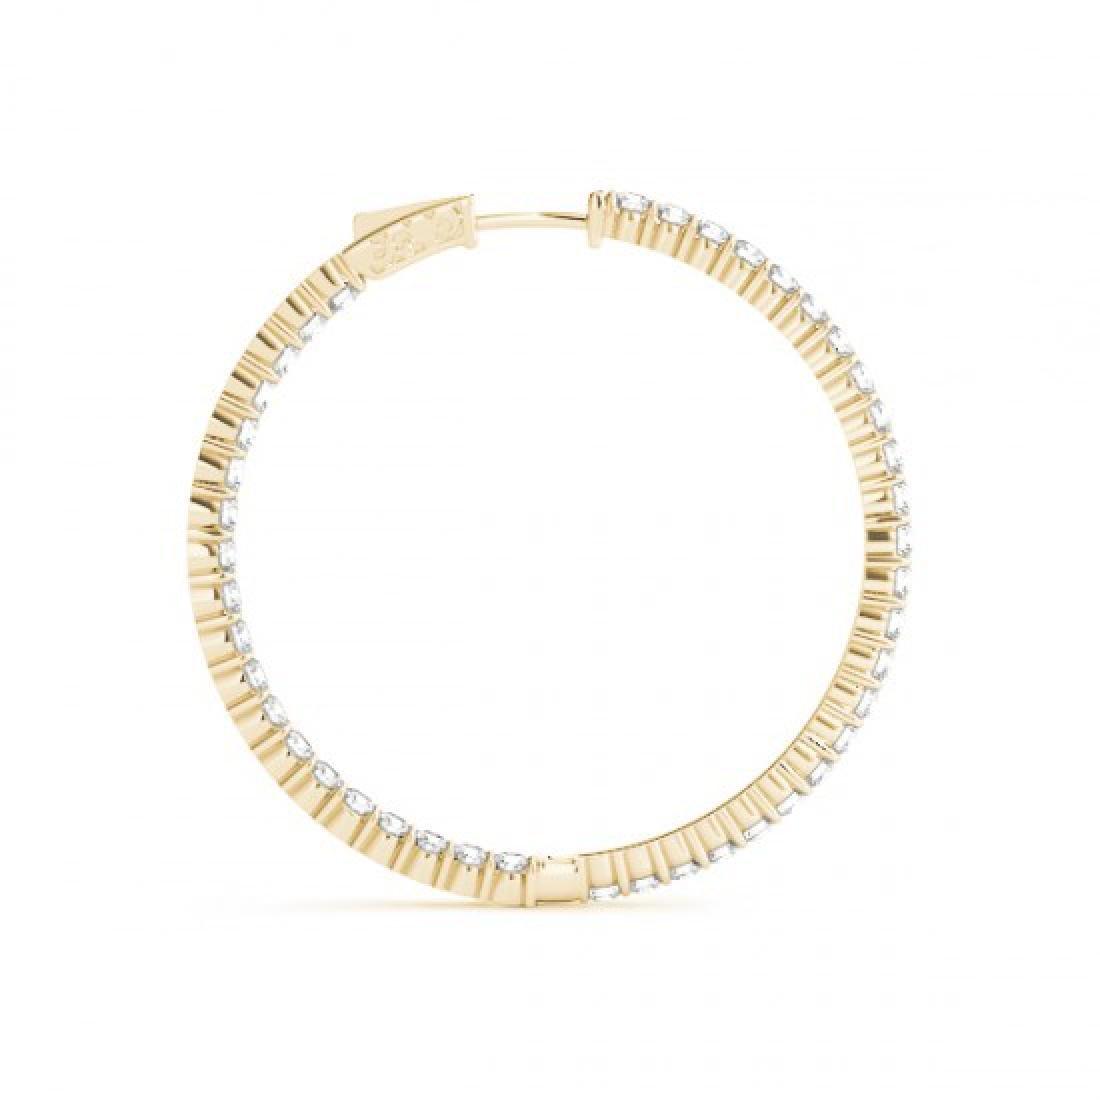 5.5 CTW Diamond VS/SI Certified 45 Mm Hoop Earrings 14K - 3